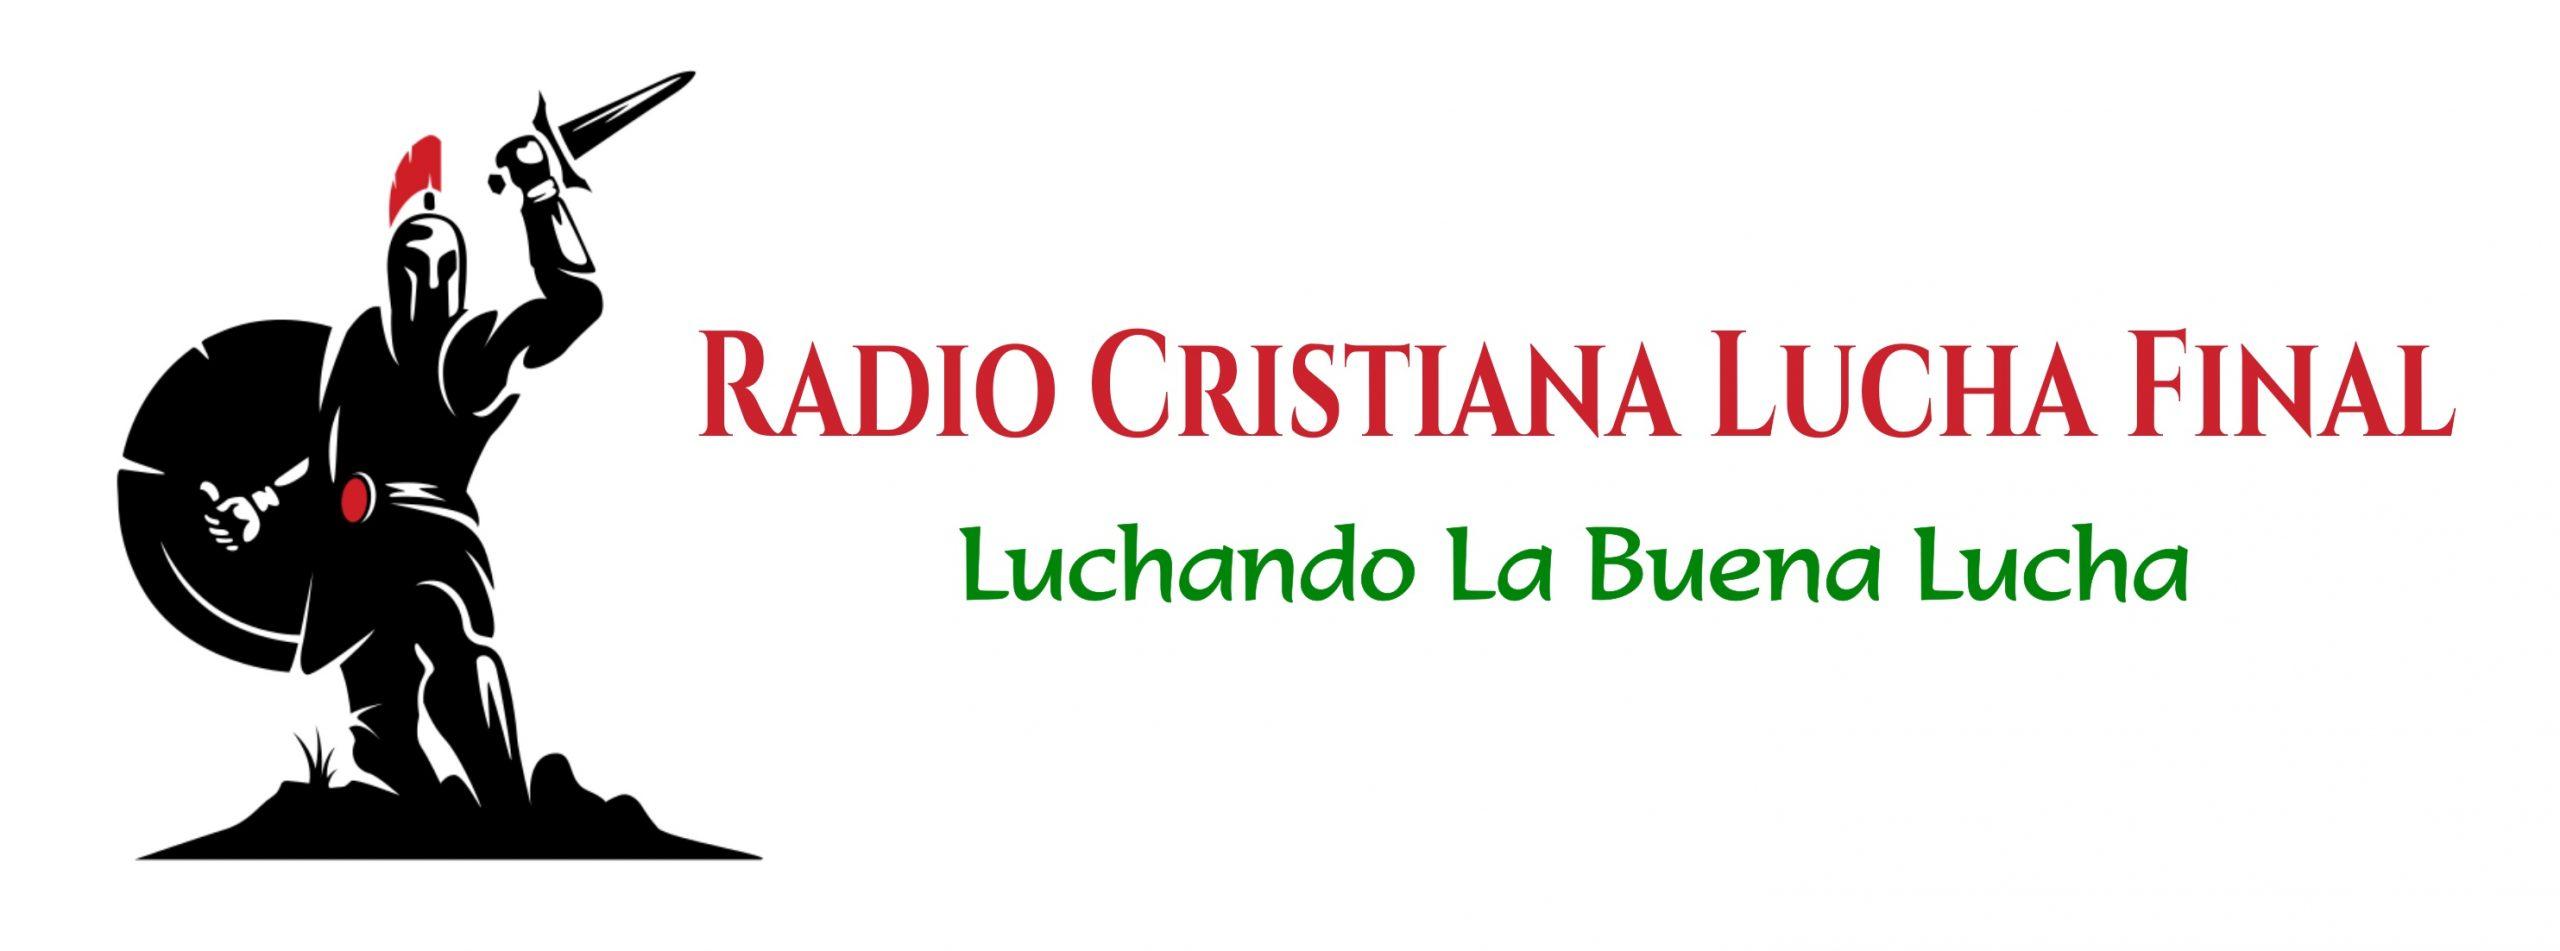 Radio Cristiana Lucha Final